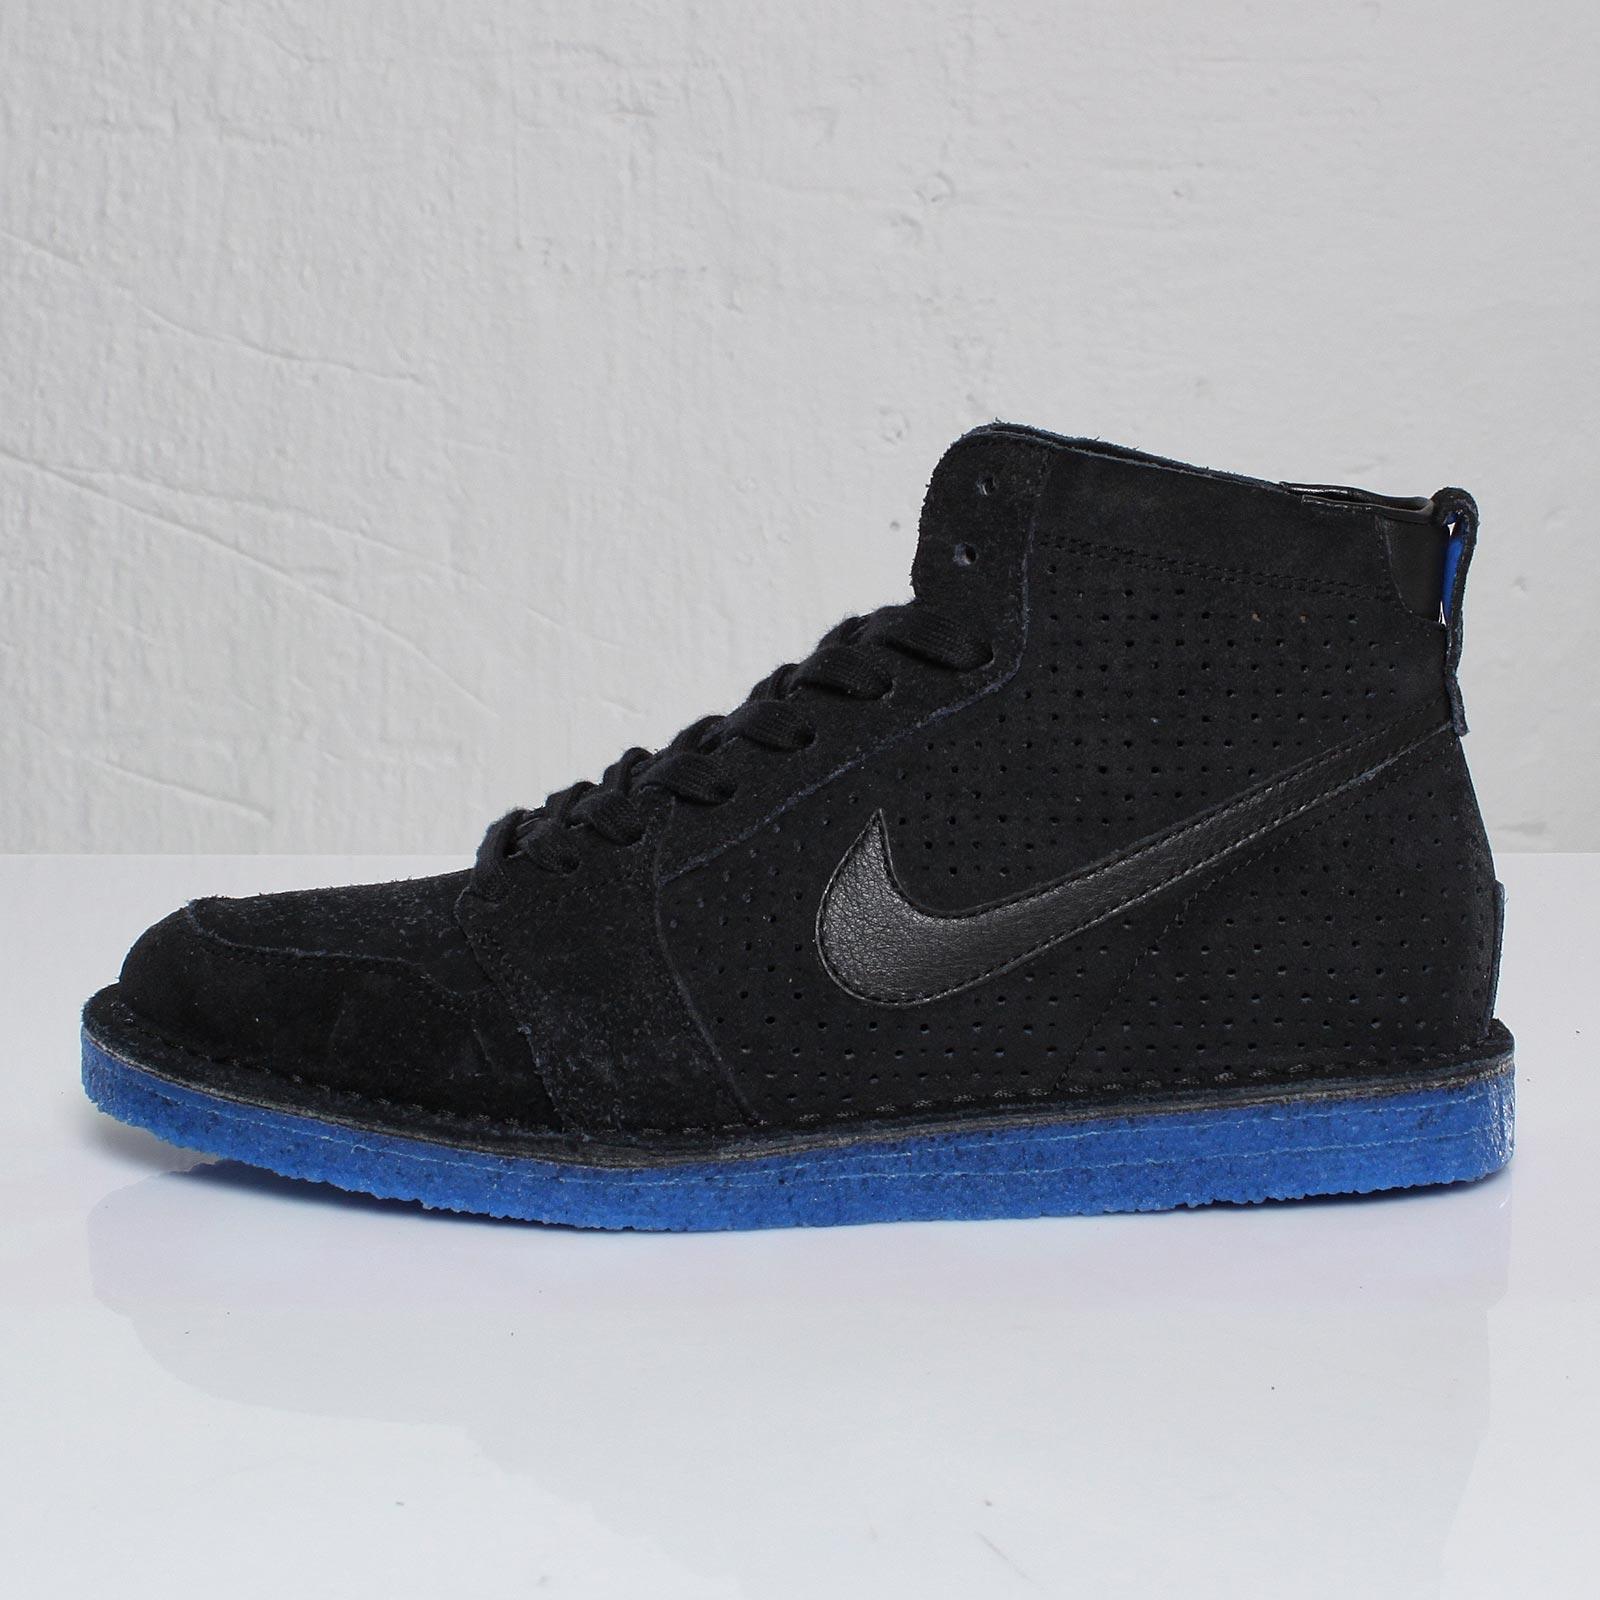 Nike Air Royal Mid SO TZ - 101649 - Sneakersnstuff  f6fff5ea6